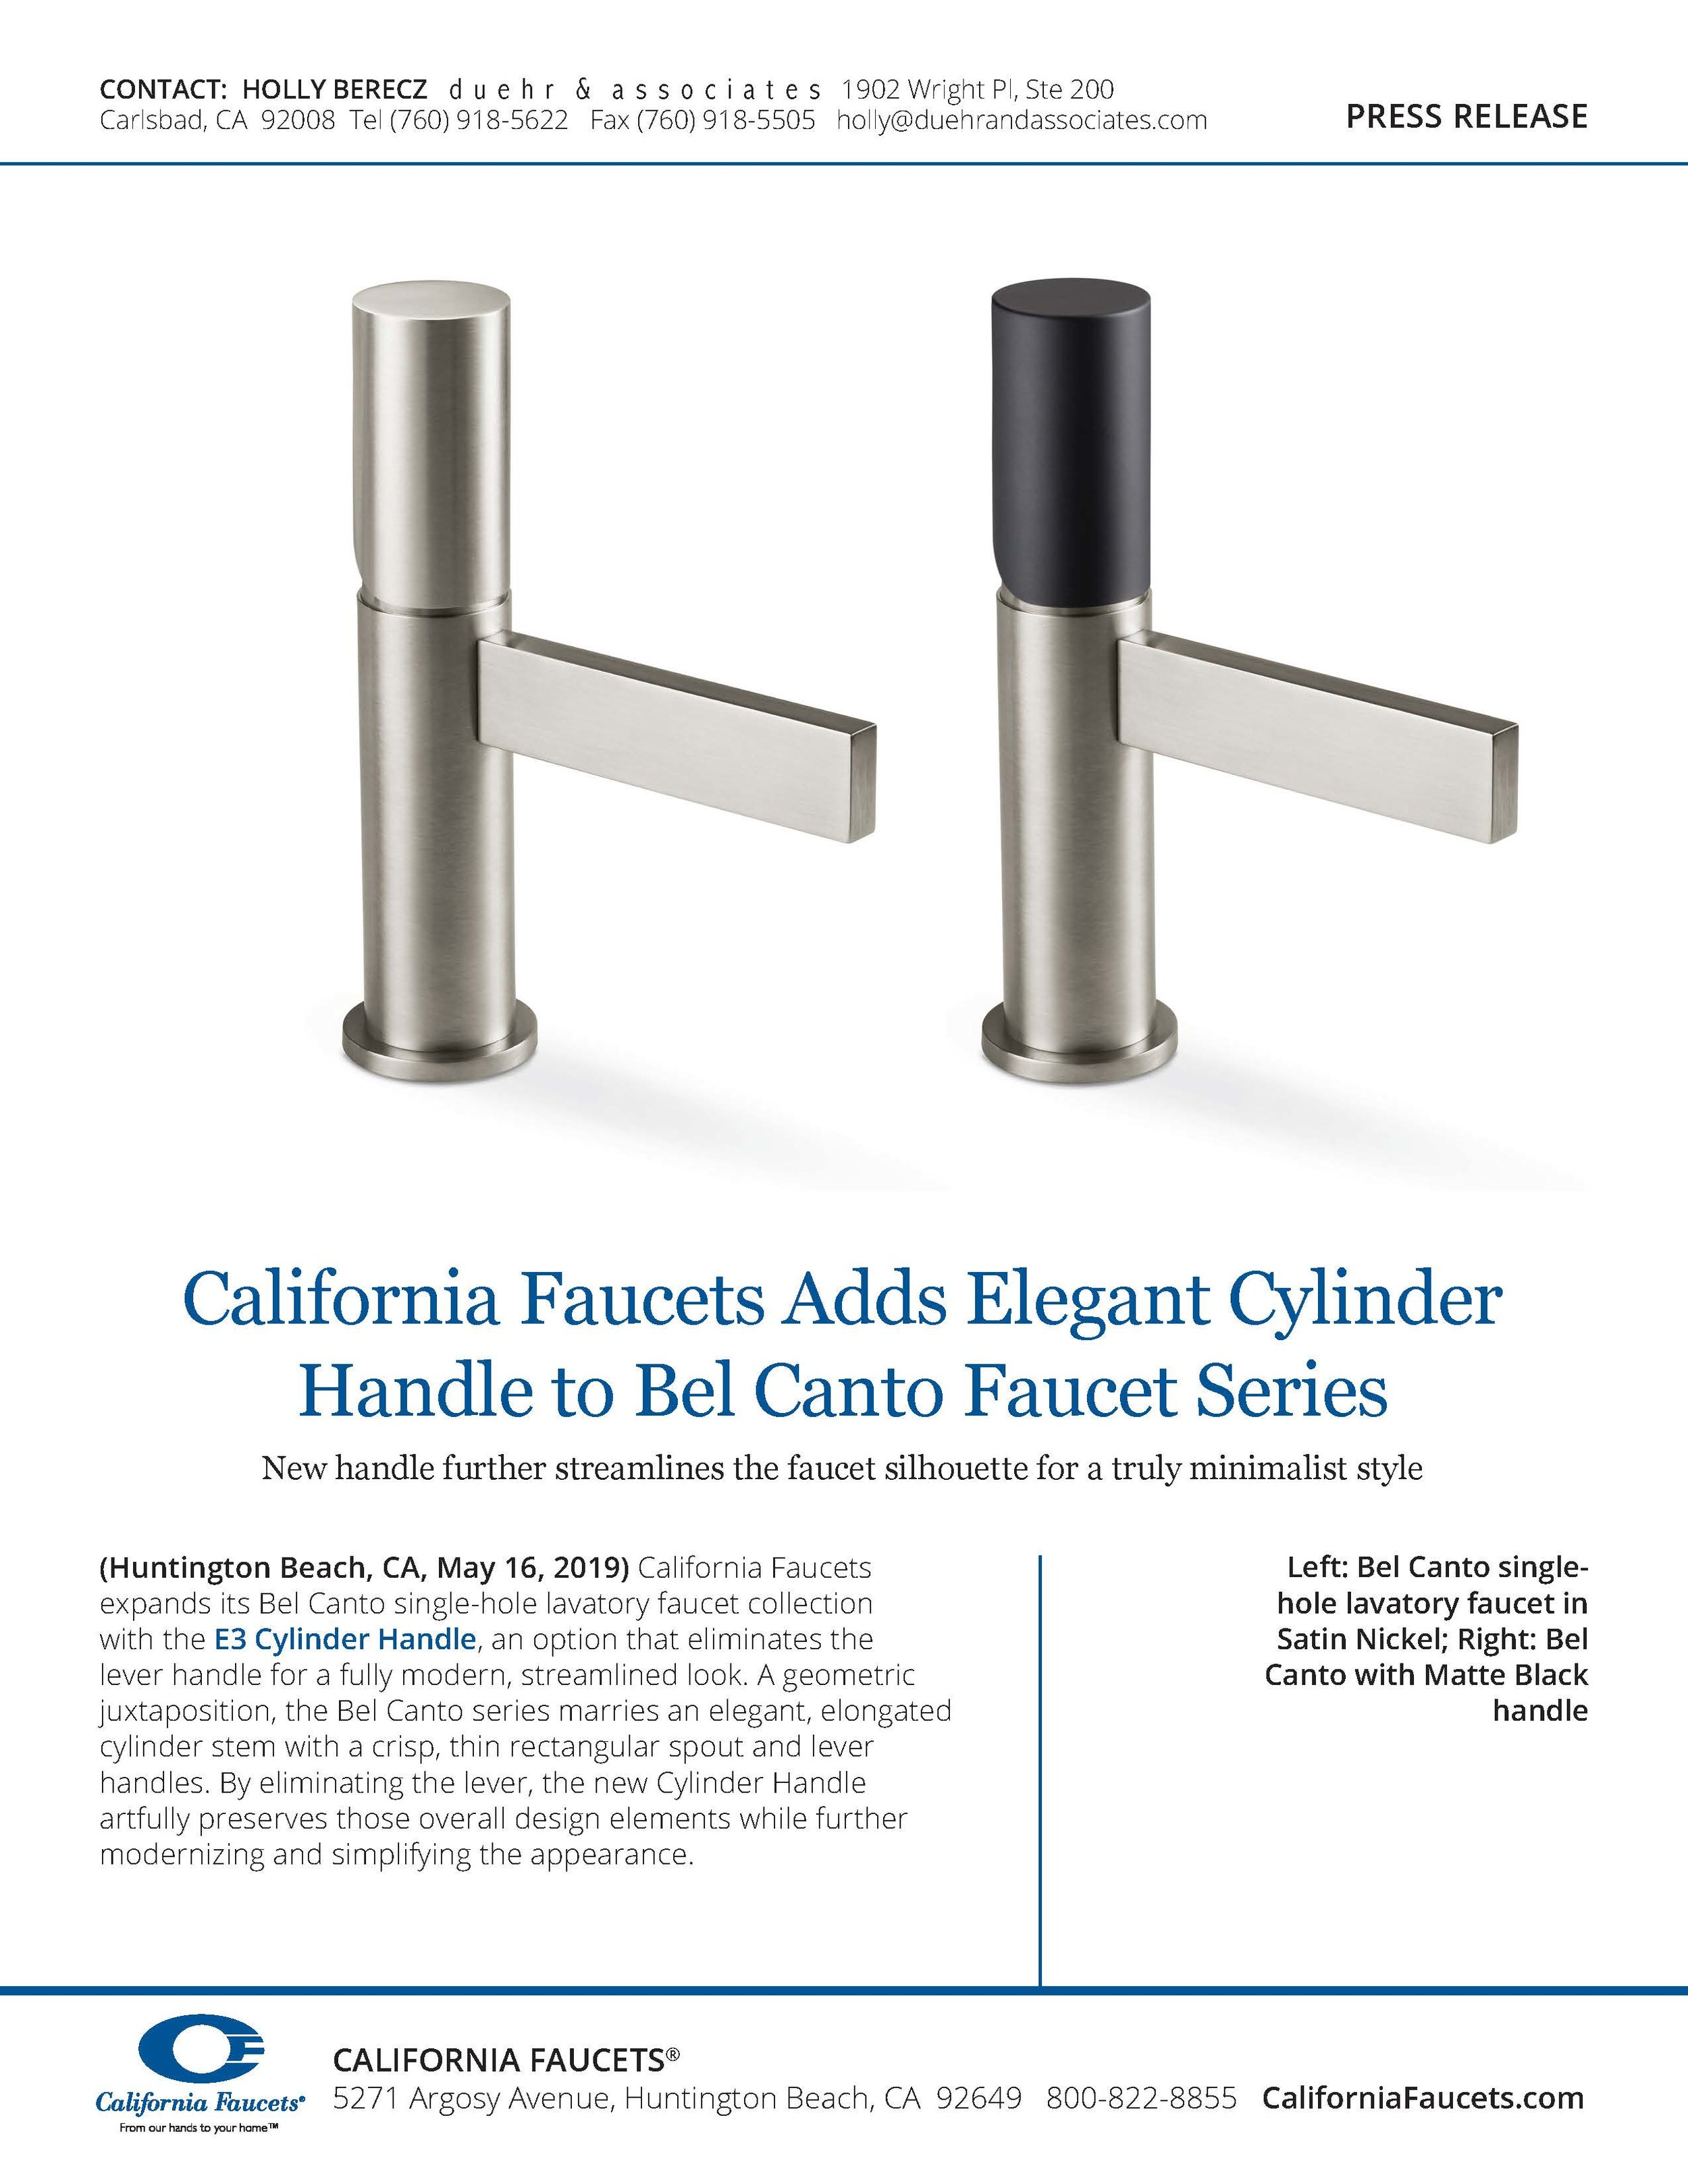 California Faucets Press Release